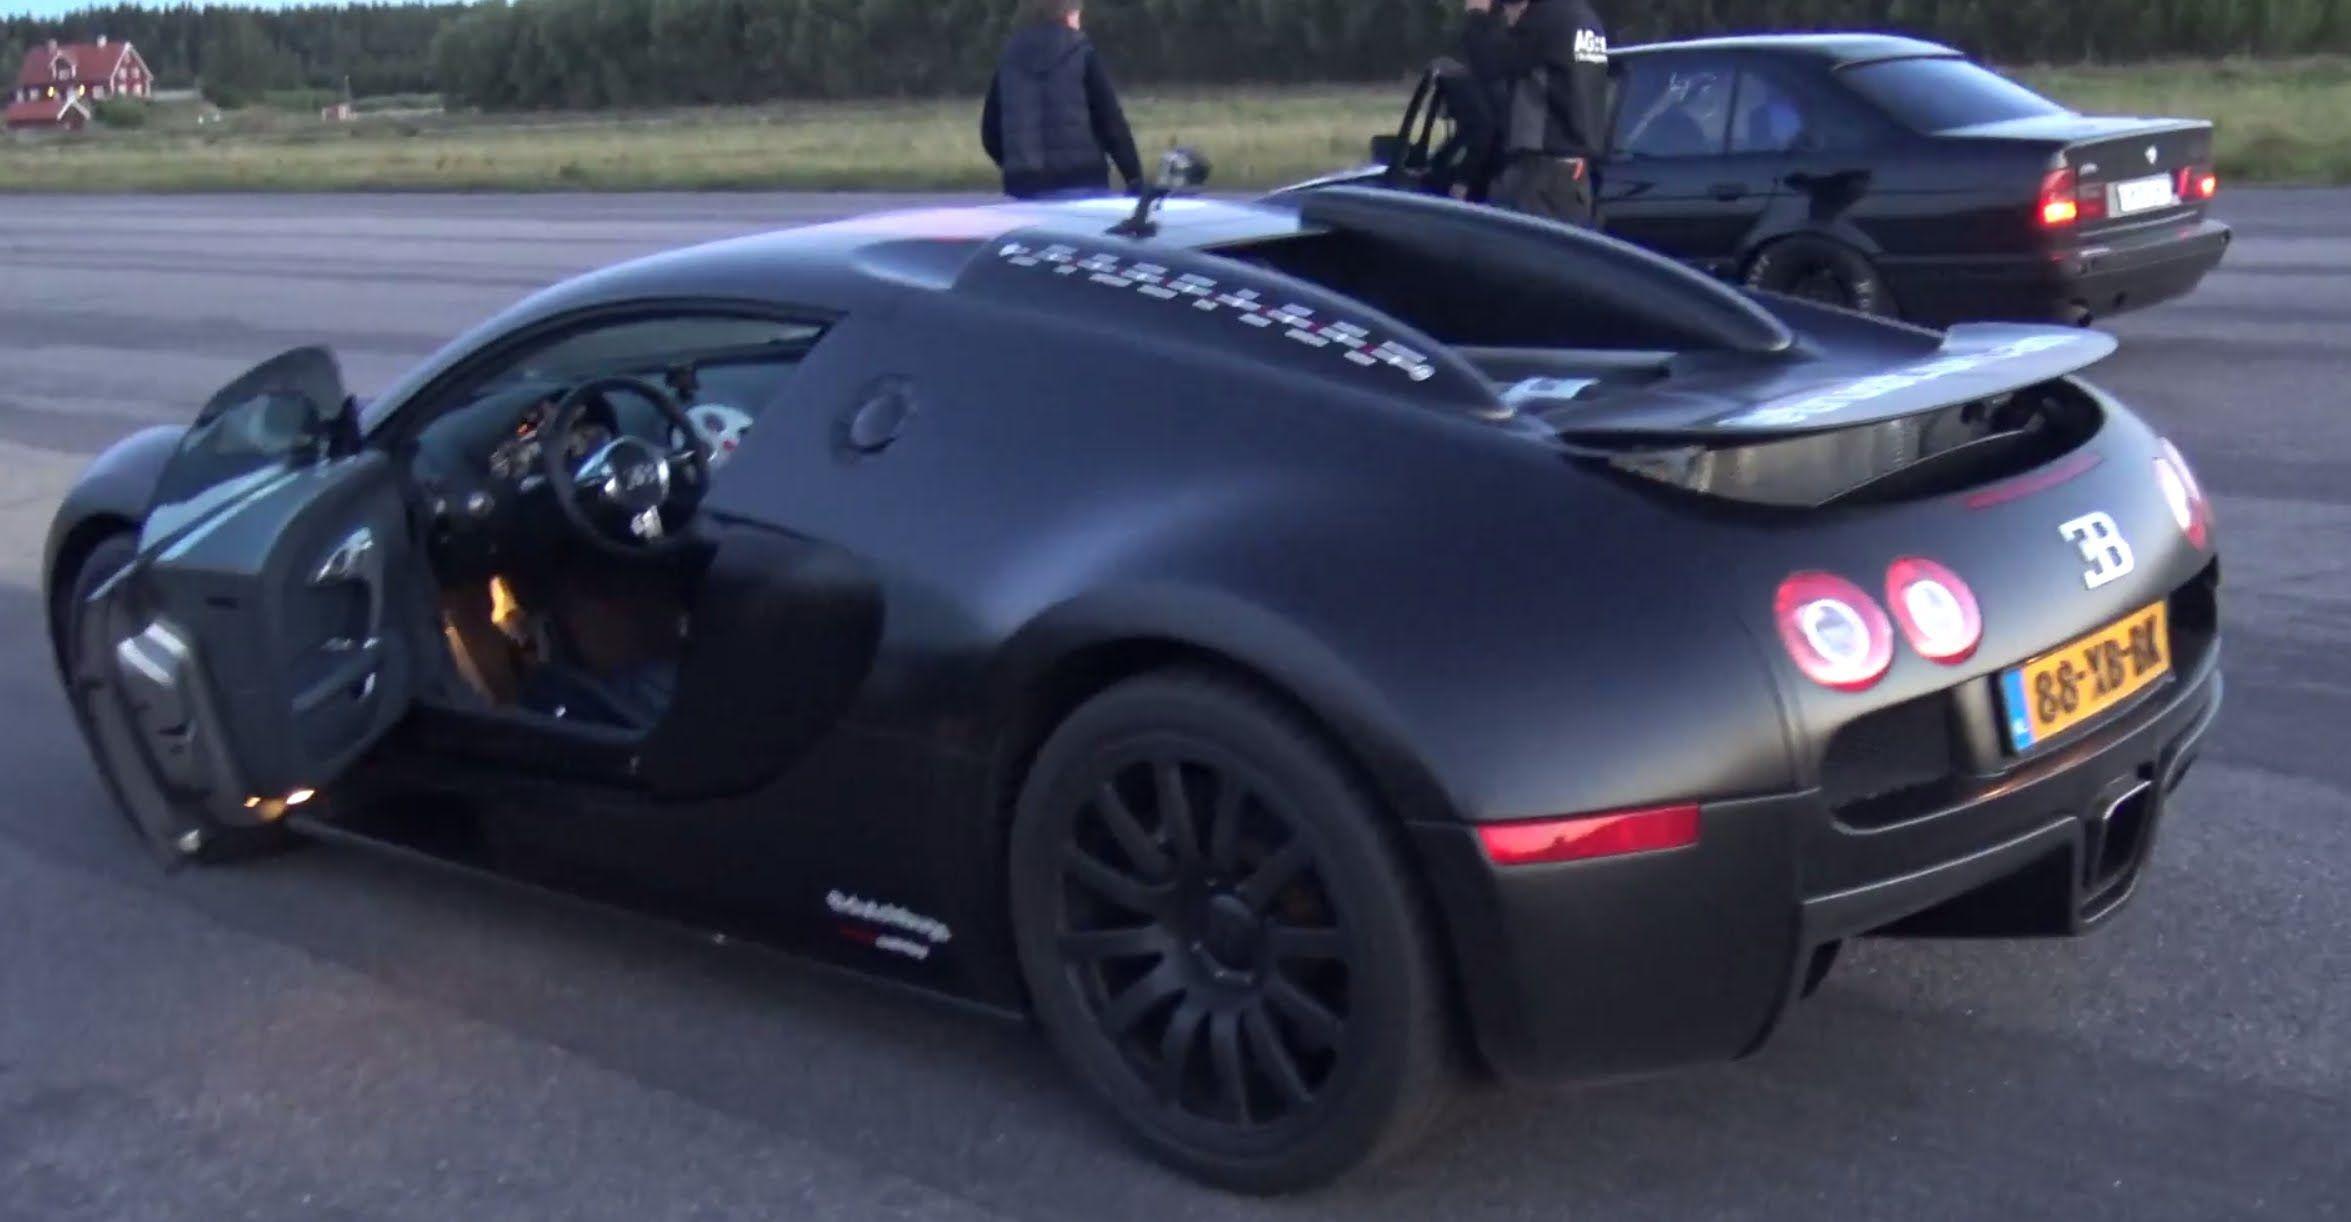 4k 1001 Hp Bugatti Veyron Dutchbugs Vs Bmw M5 E34 Turbo 900 Rwhp By Ag Bugatti Bugatti Veyron Veyron